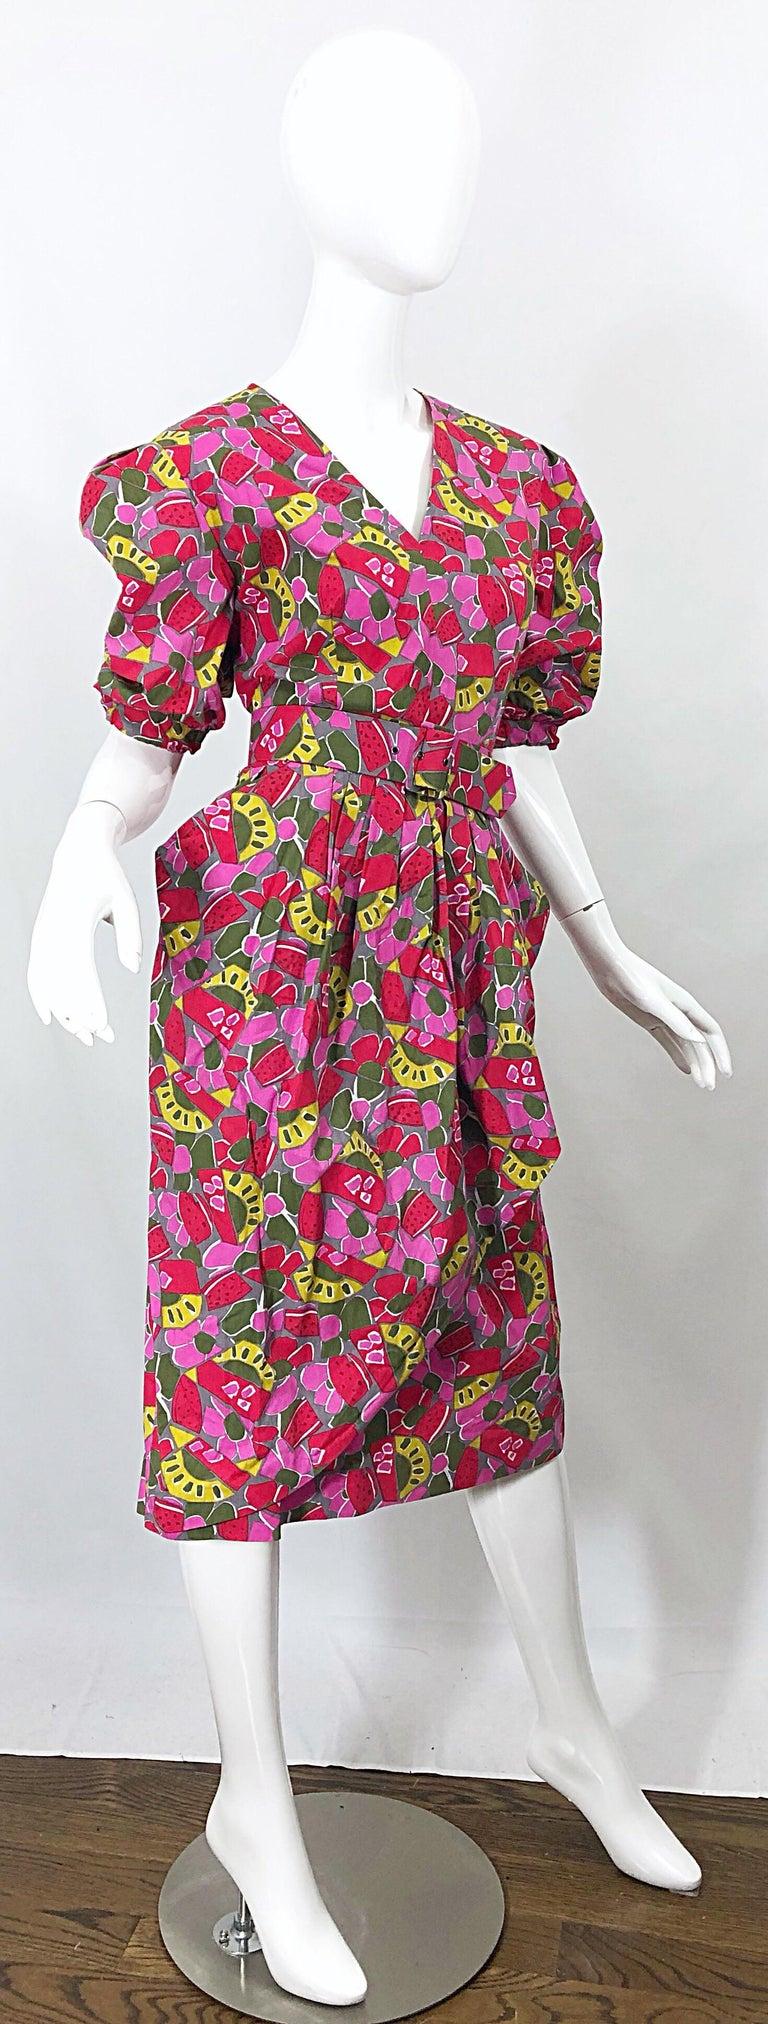 1980s Guy Laroche Size 44 / 12 Novelty Fruit Print Avant Garde Vintage 80s Dress For Sale 5